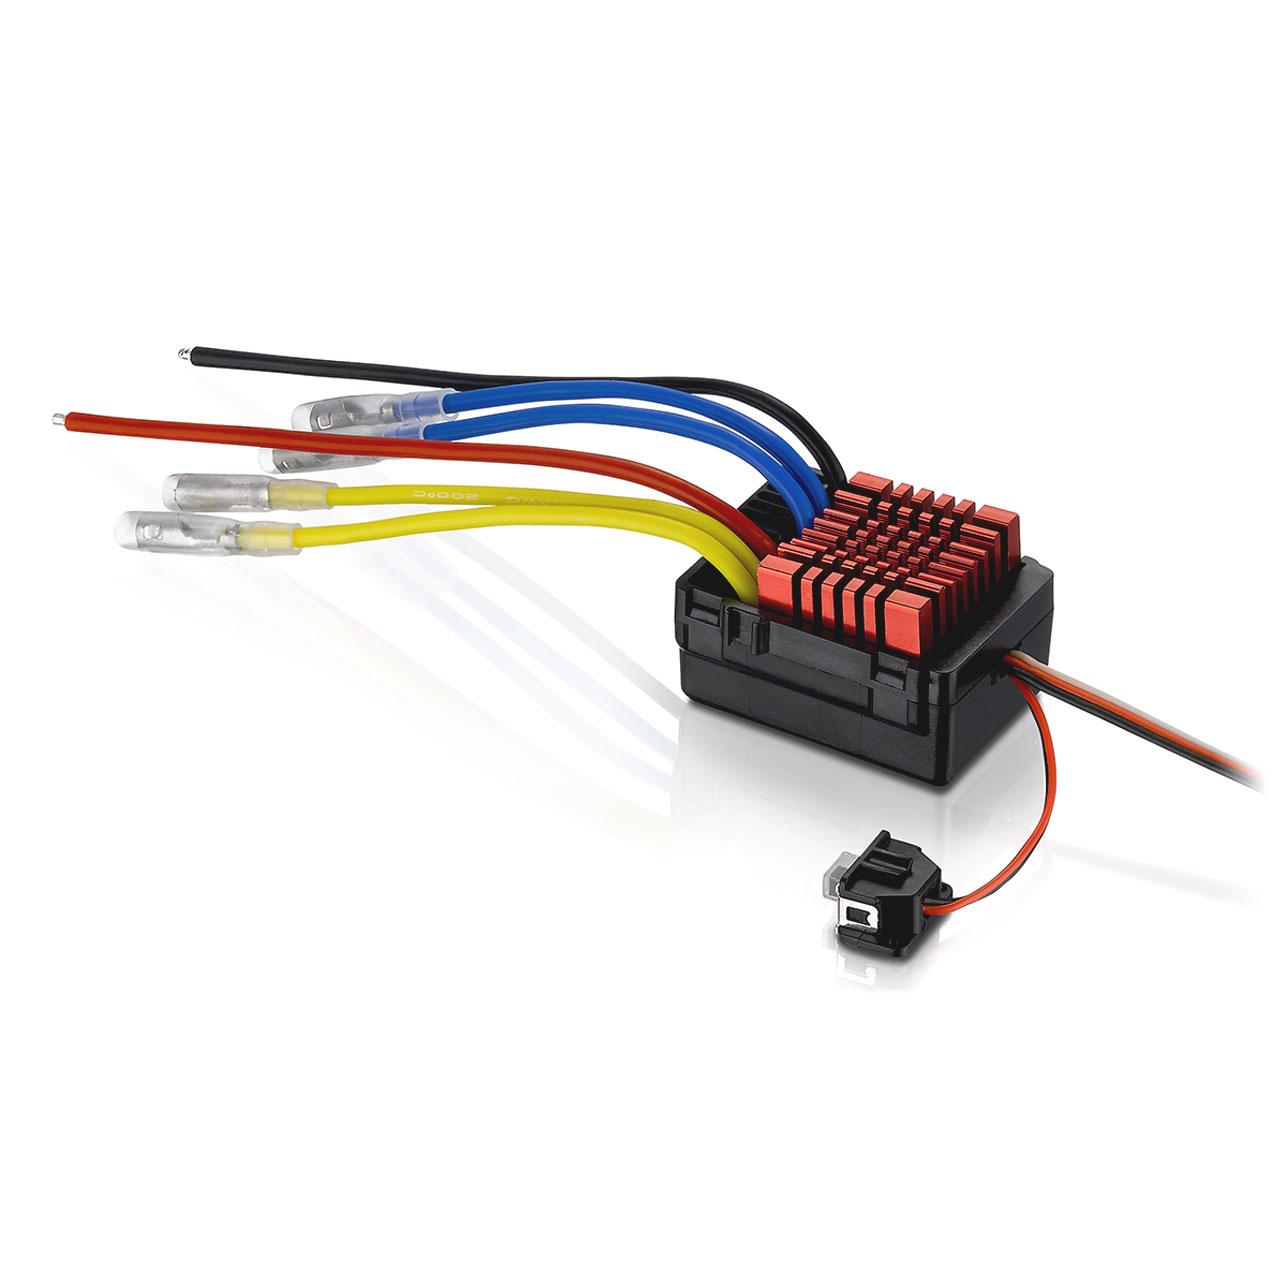 ESC Hobbywing QuicRun 880 cepillado 80A para 1:8 y 1:10